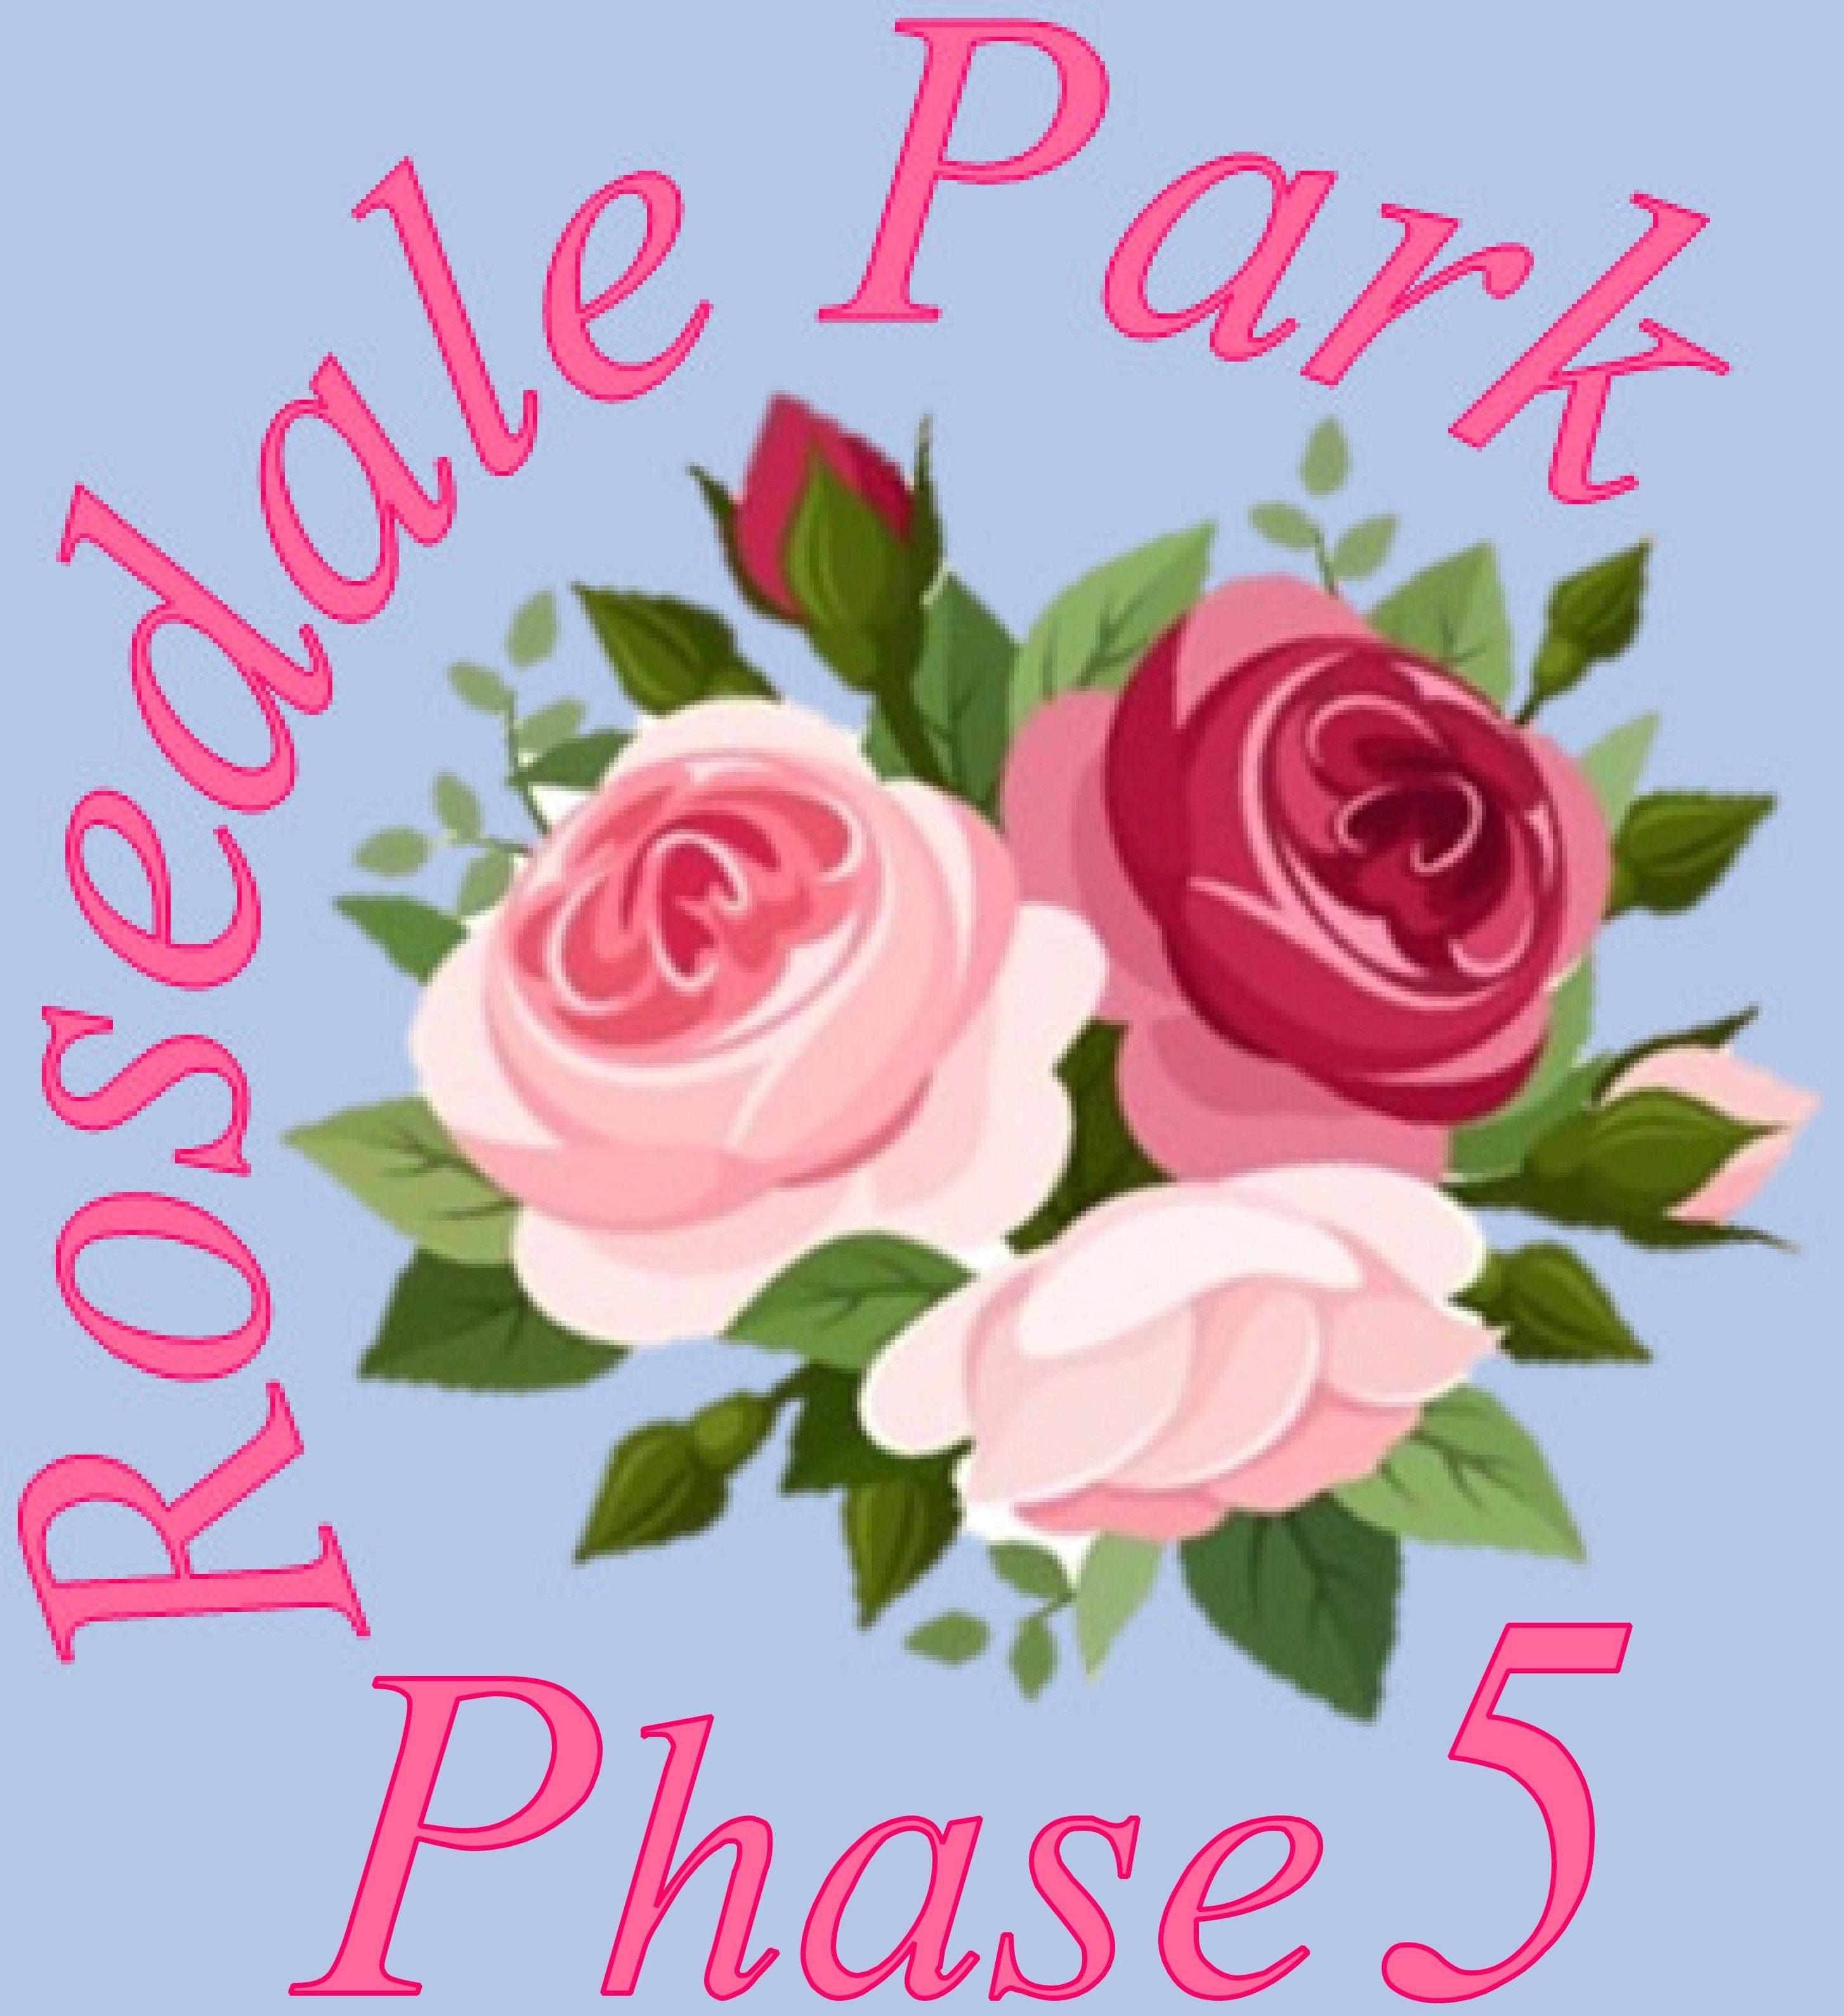 Rosedale Park Phase 5 Residents Association